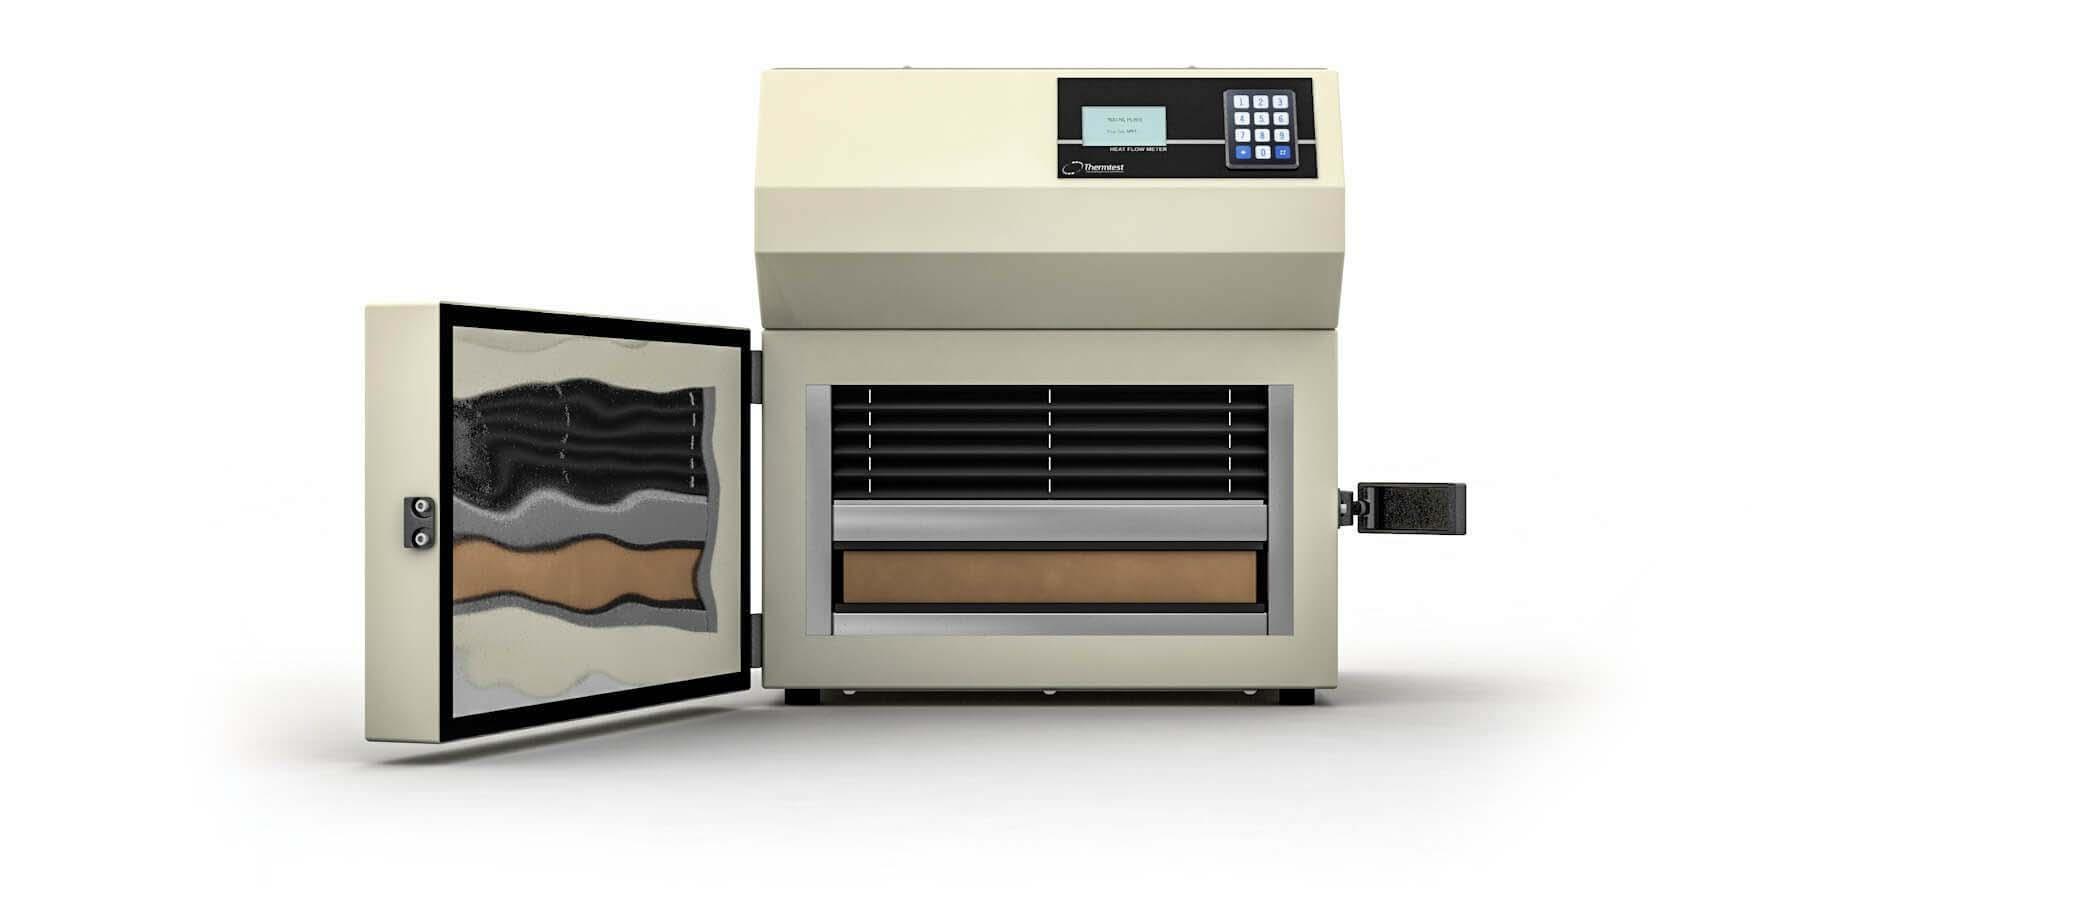 hfm-100-heat-flow-meter-thermal-conductivity-equipment